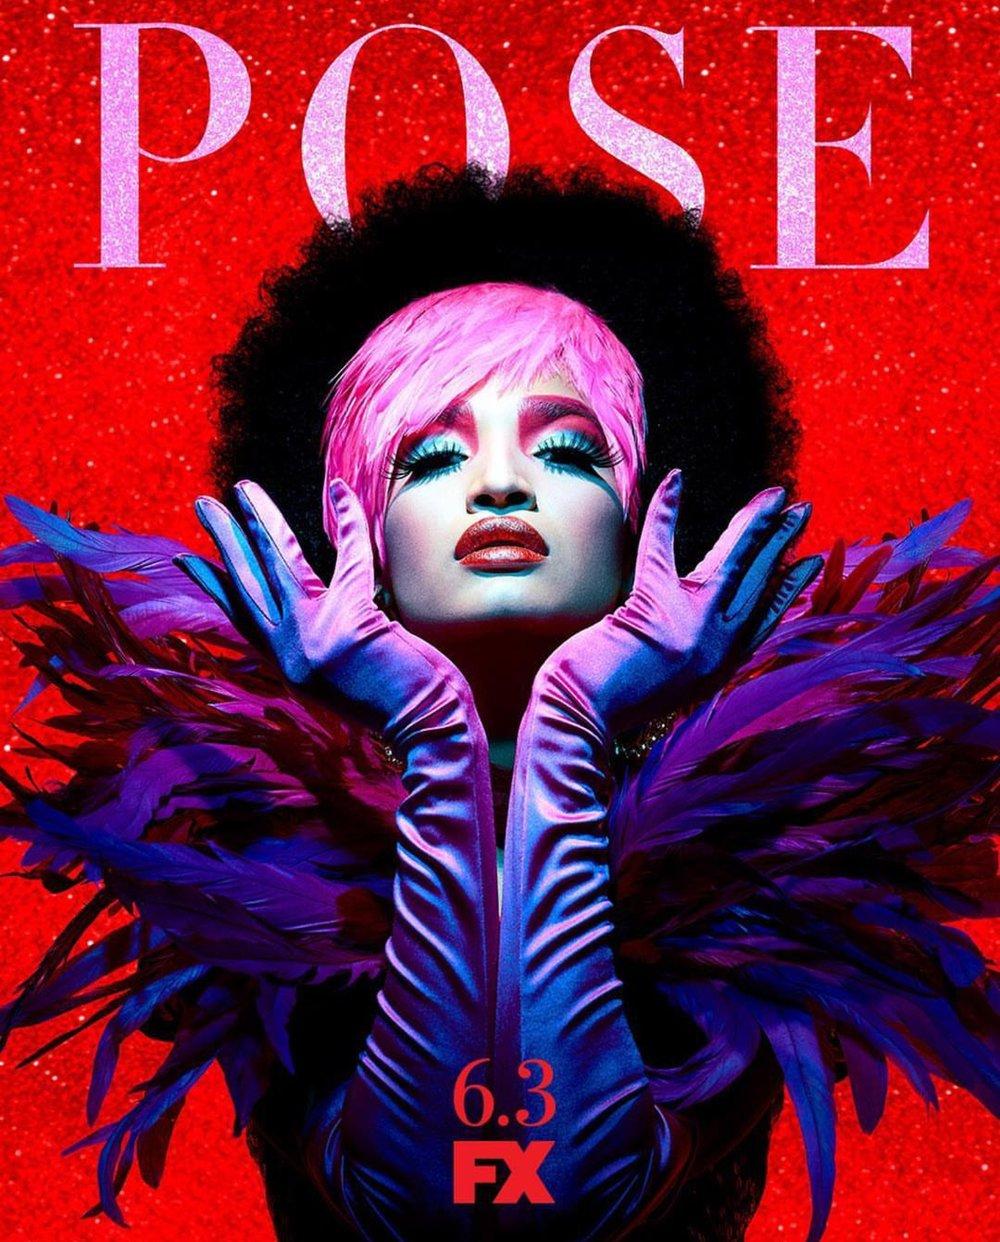 Pop Disciple Pose FX Mac Quayle Amanda Krieg-Thomas